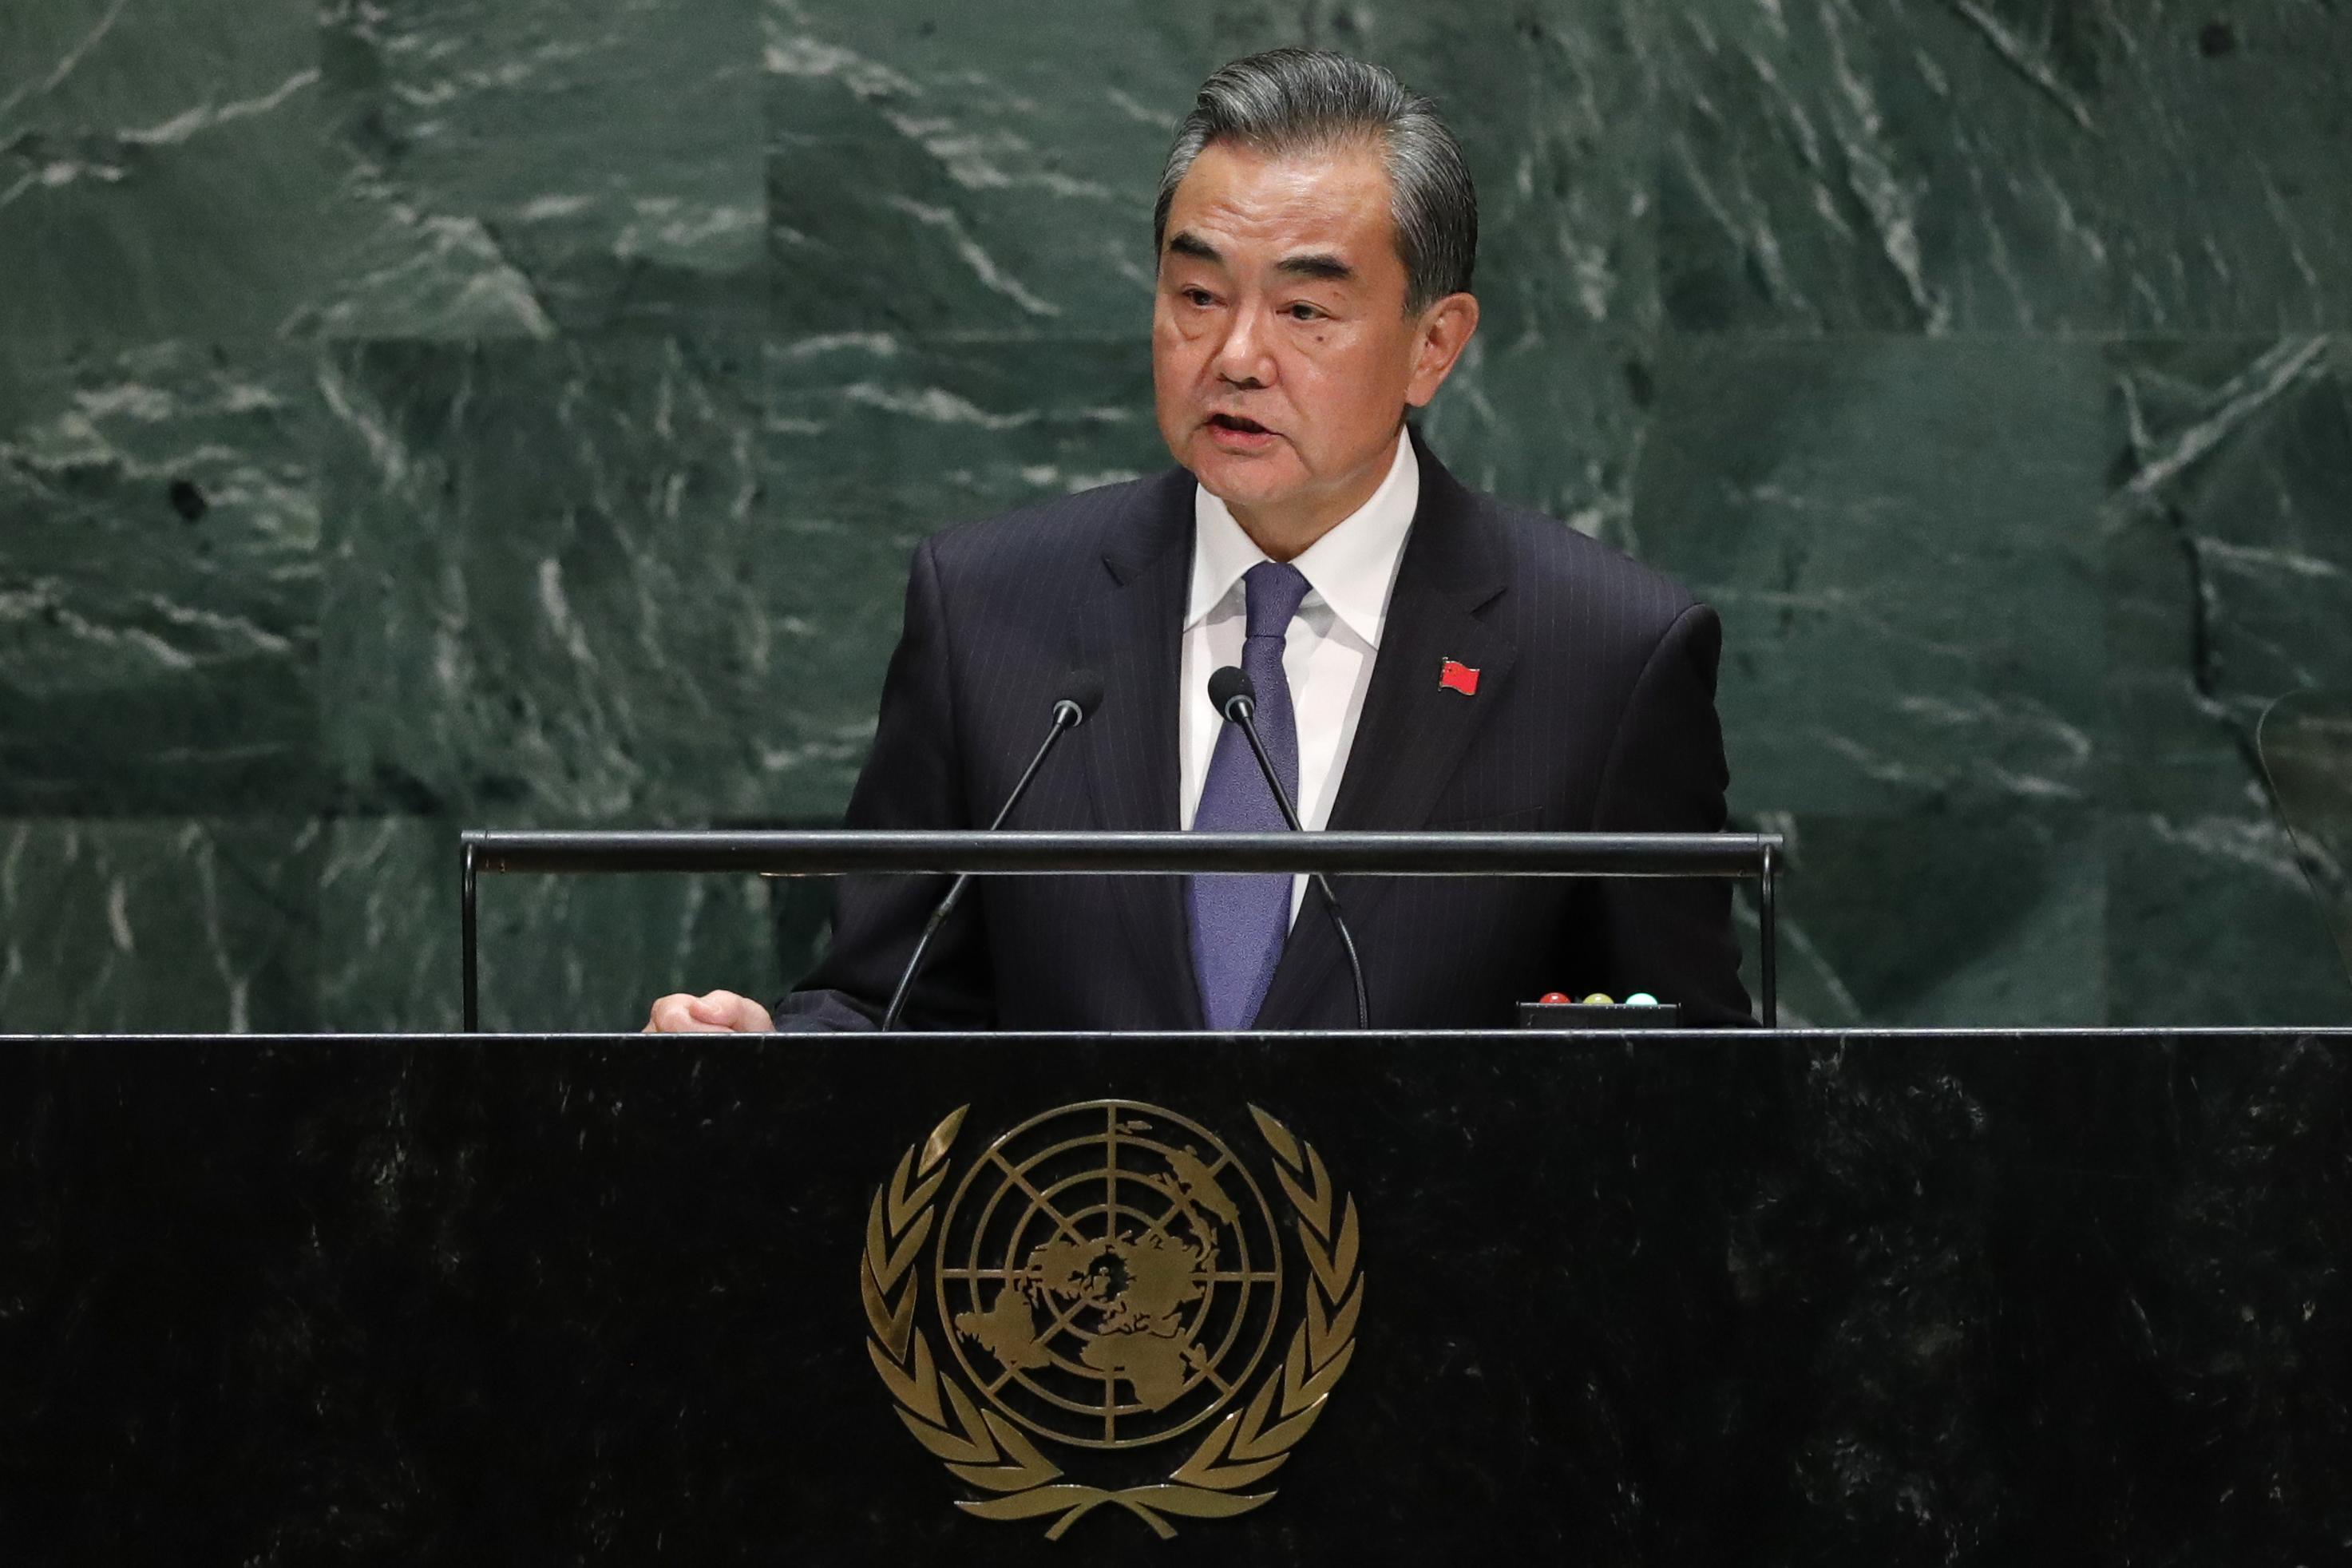 In swipe at Trump, China tells U.N. tariffs could plunge world into...